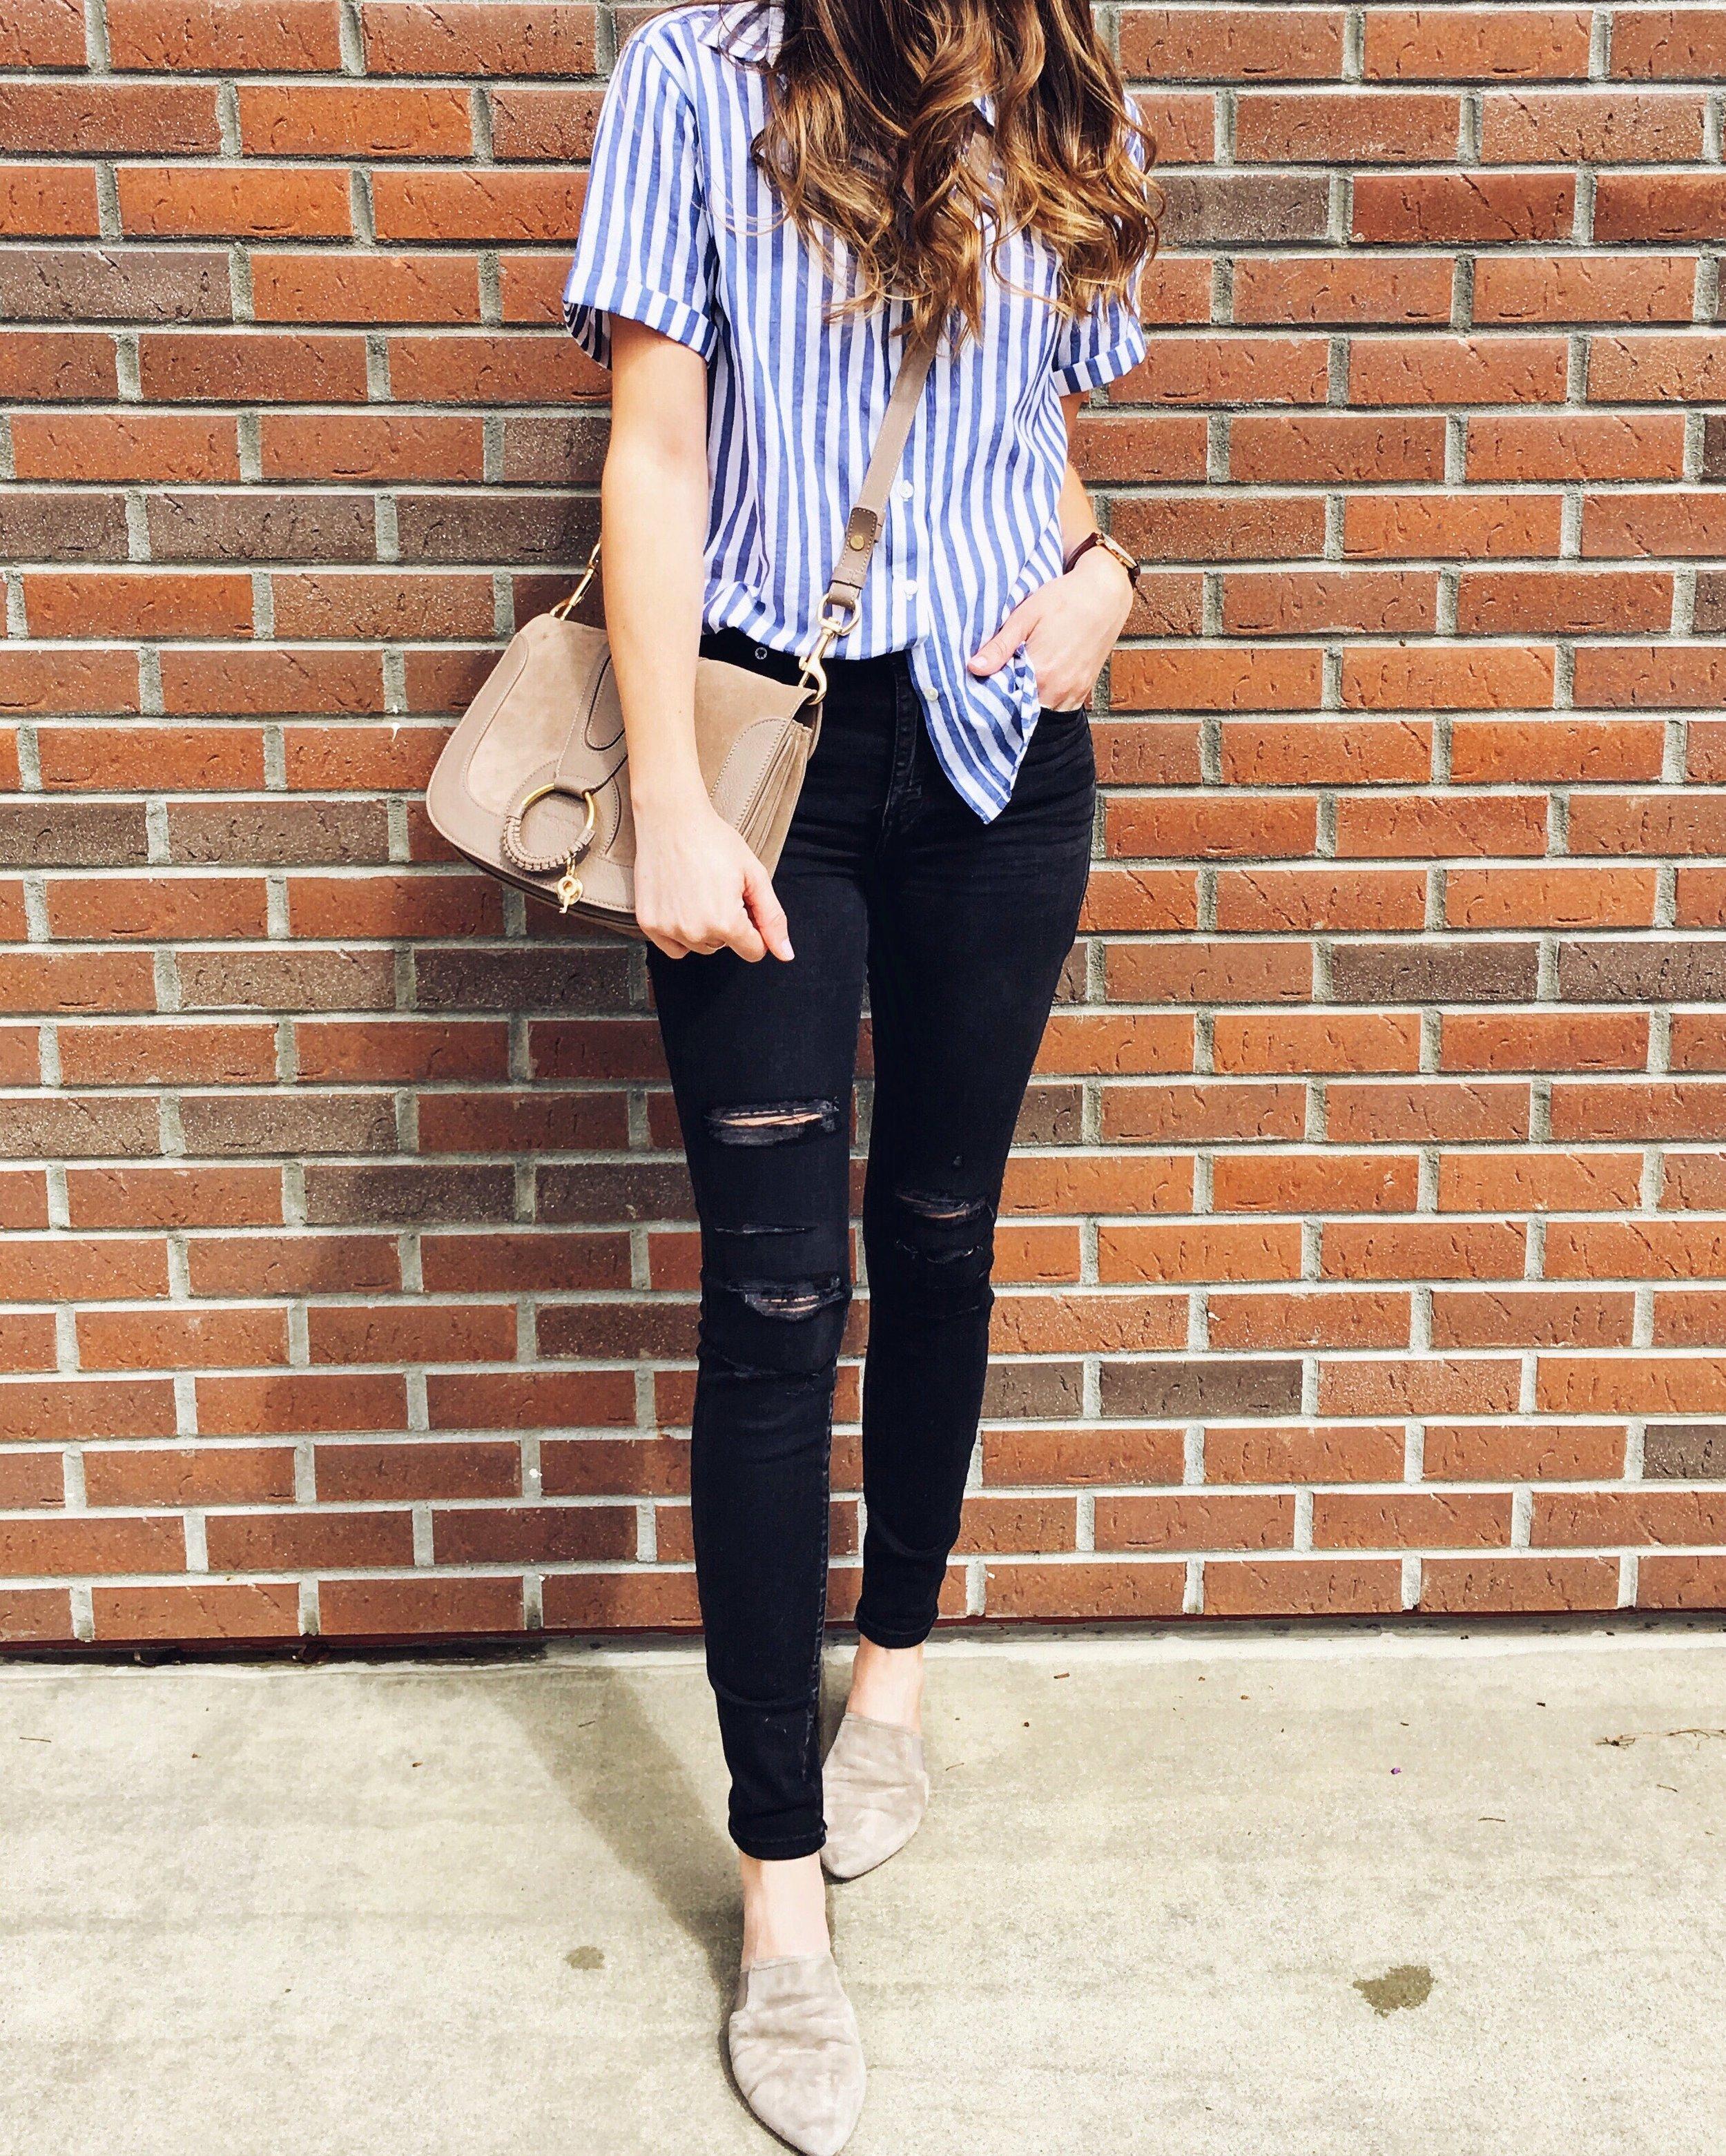 Velvet by Graham & Spencer Top  |  Abercrombie Jeans  |  Vince Slides  |  See by Chloe Bag